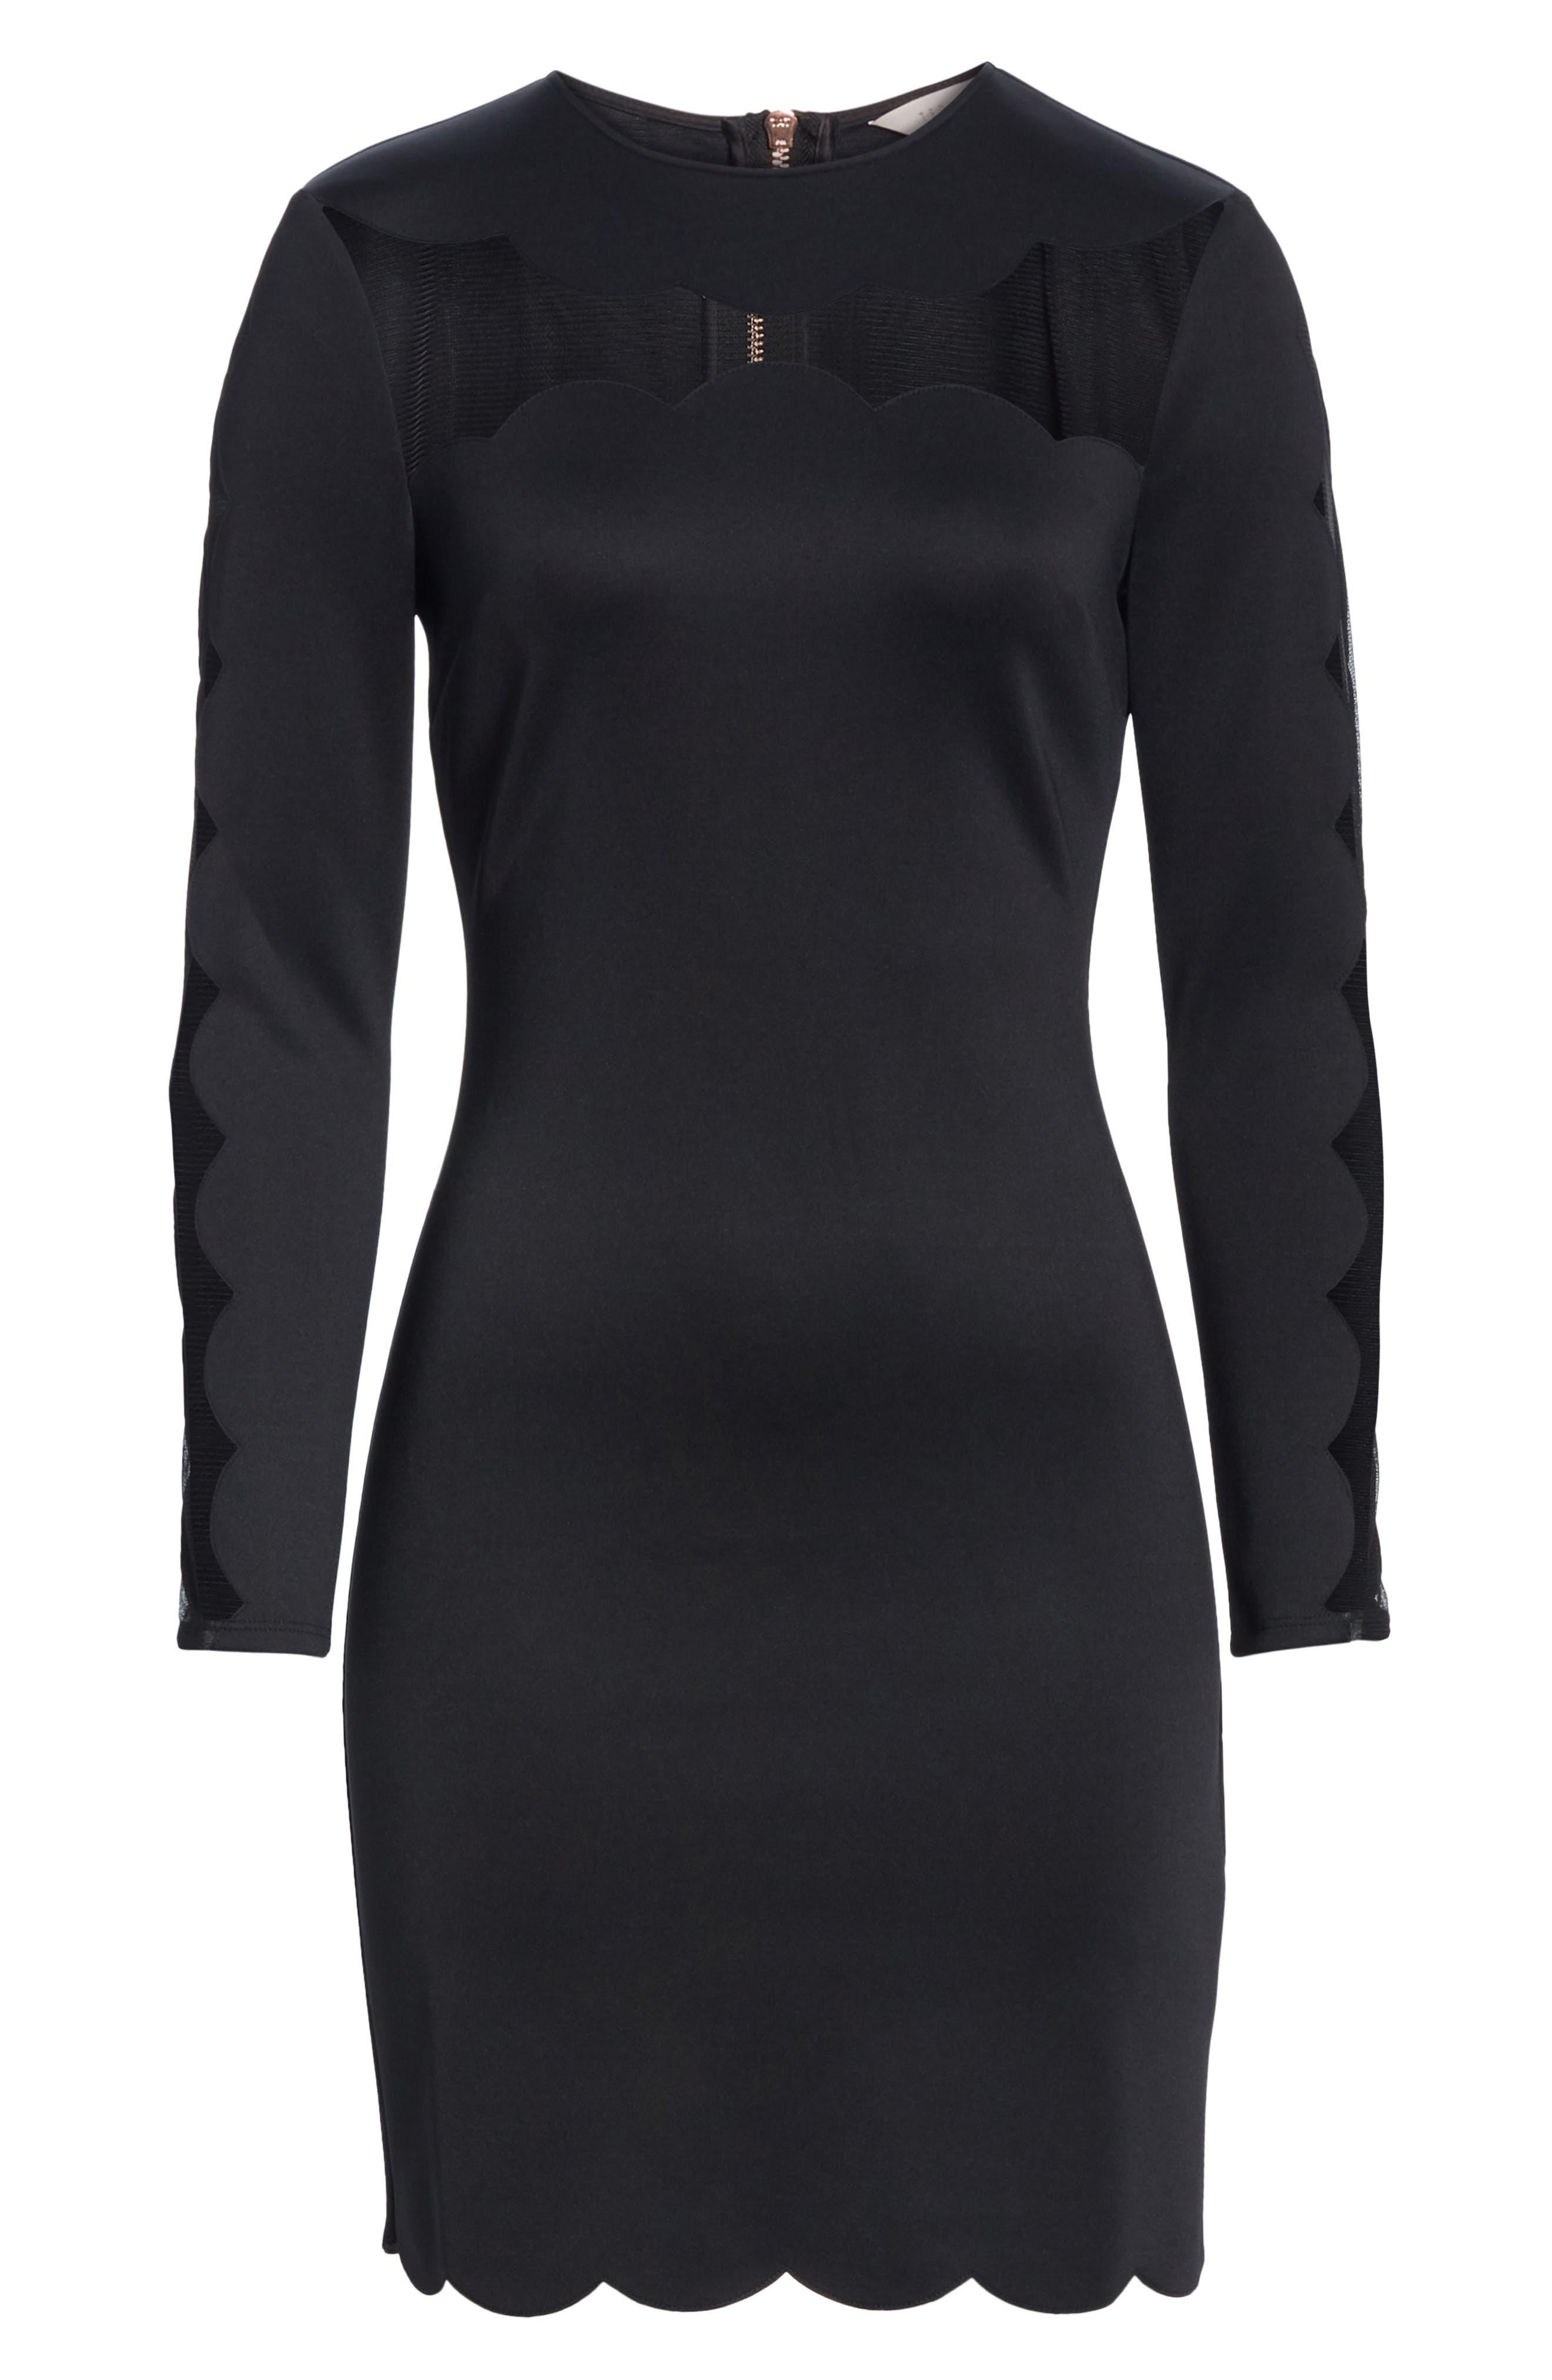 Serenity Joyous Body-Con Dress,                             Alternate thumbnail 6, color,                             BLACK